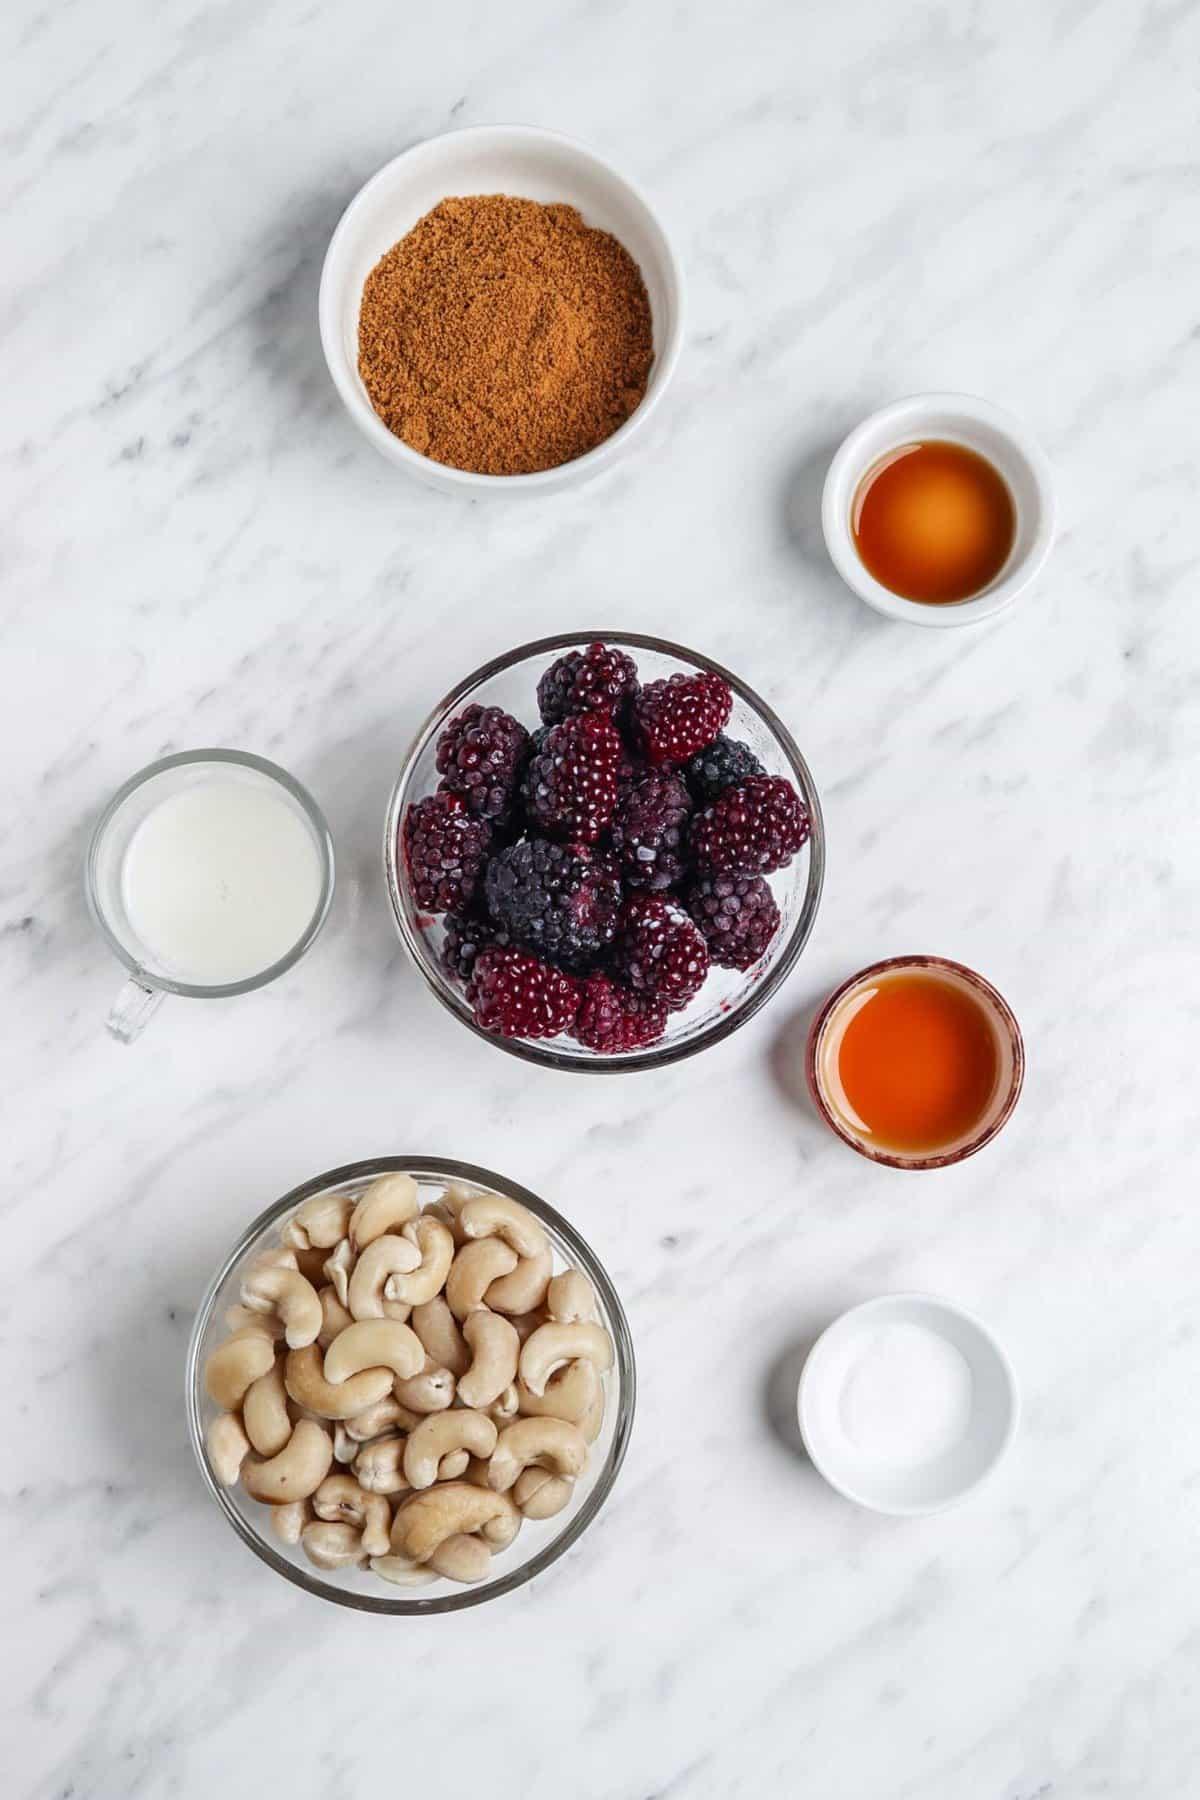 Blackberry Vanilla Pudding Ingredients